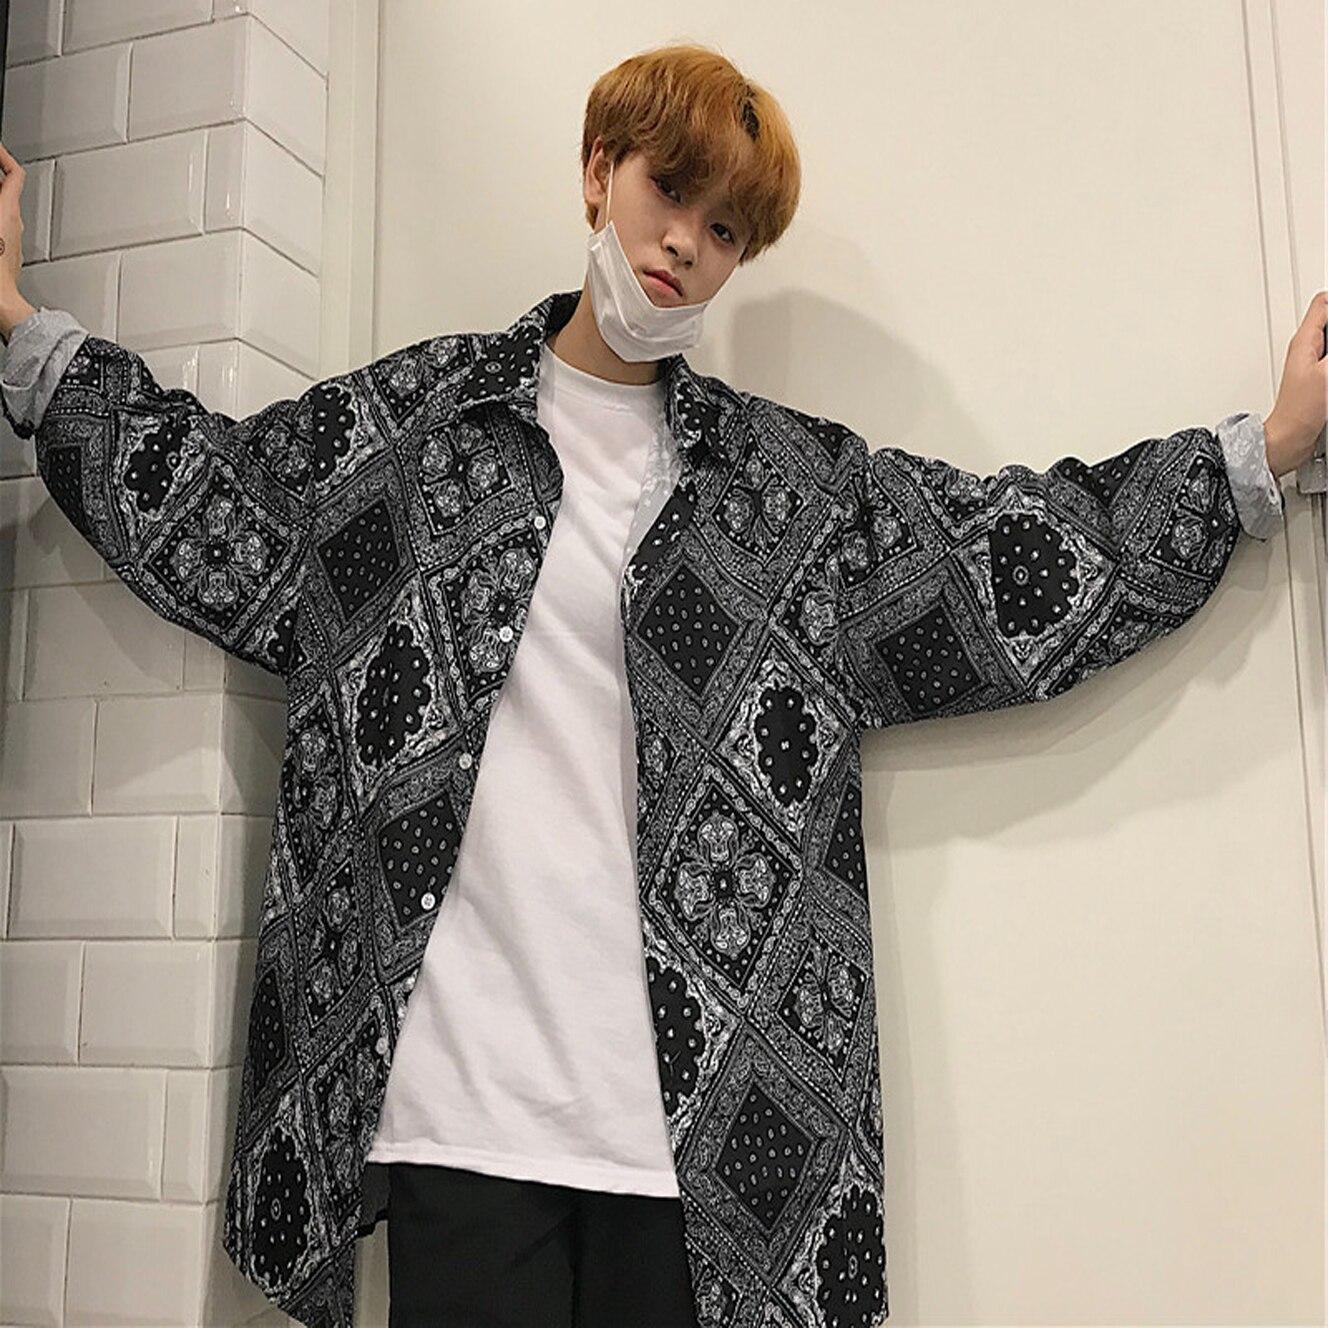 Korean Men/Women Harajuku Streetwear Hiphop Loose Oversized Bandana Paisley Print Tee Top Shirt Blouse Long Sleeve Block Plaid